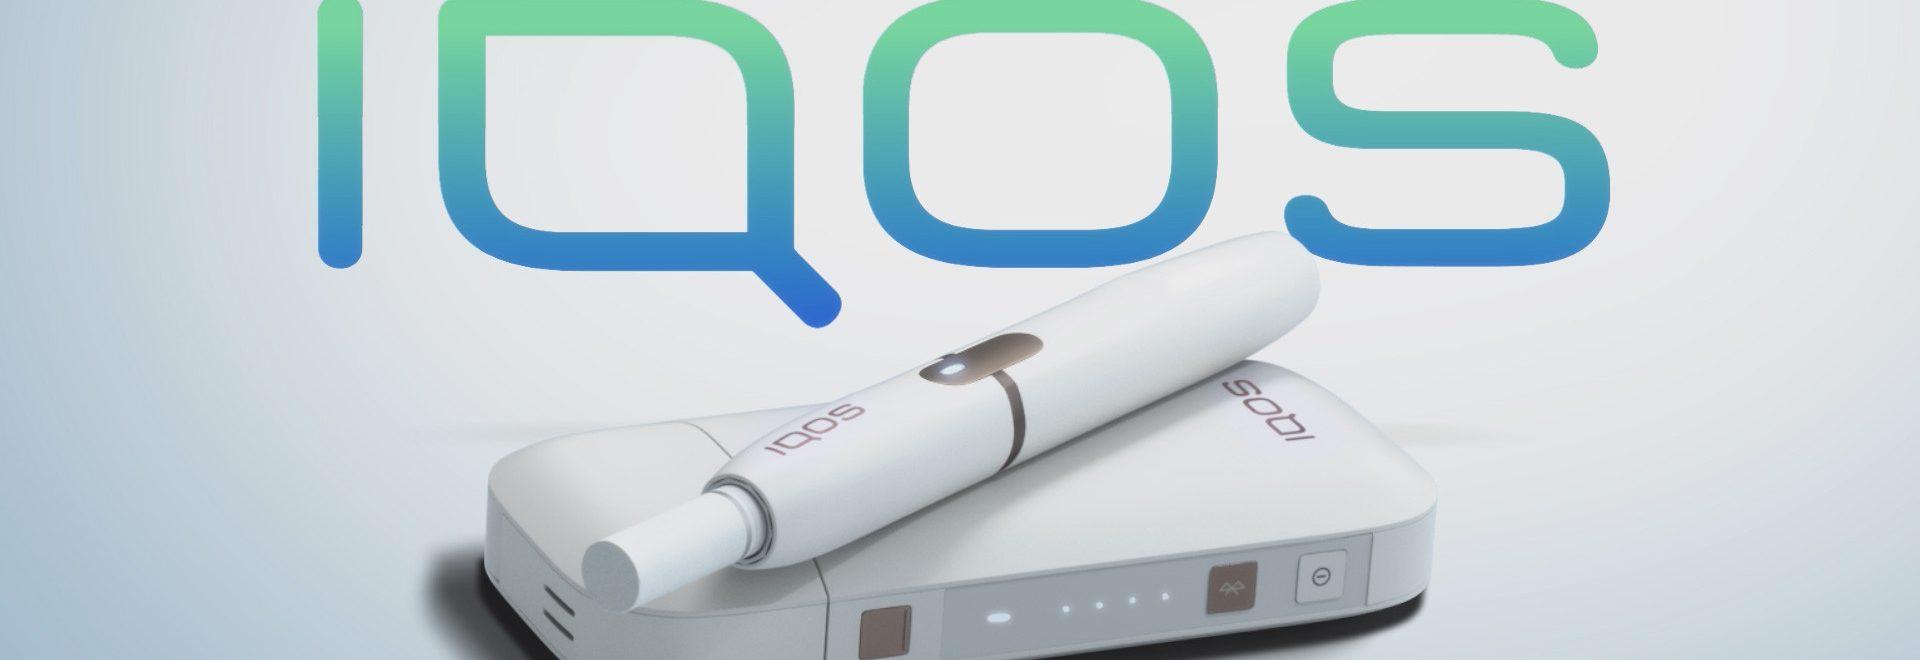 IQOS от Philip Morris 💨VAPE жидкости/основы/железо🔋 Цены➔ ilfumo.ru